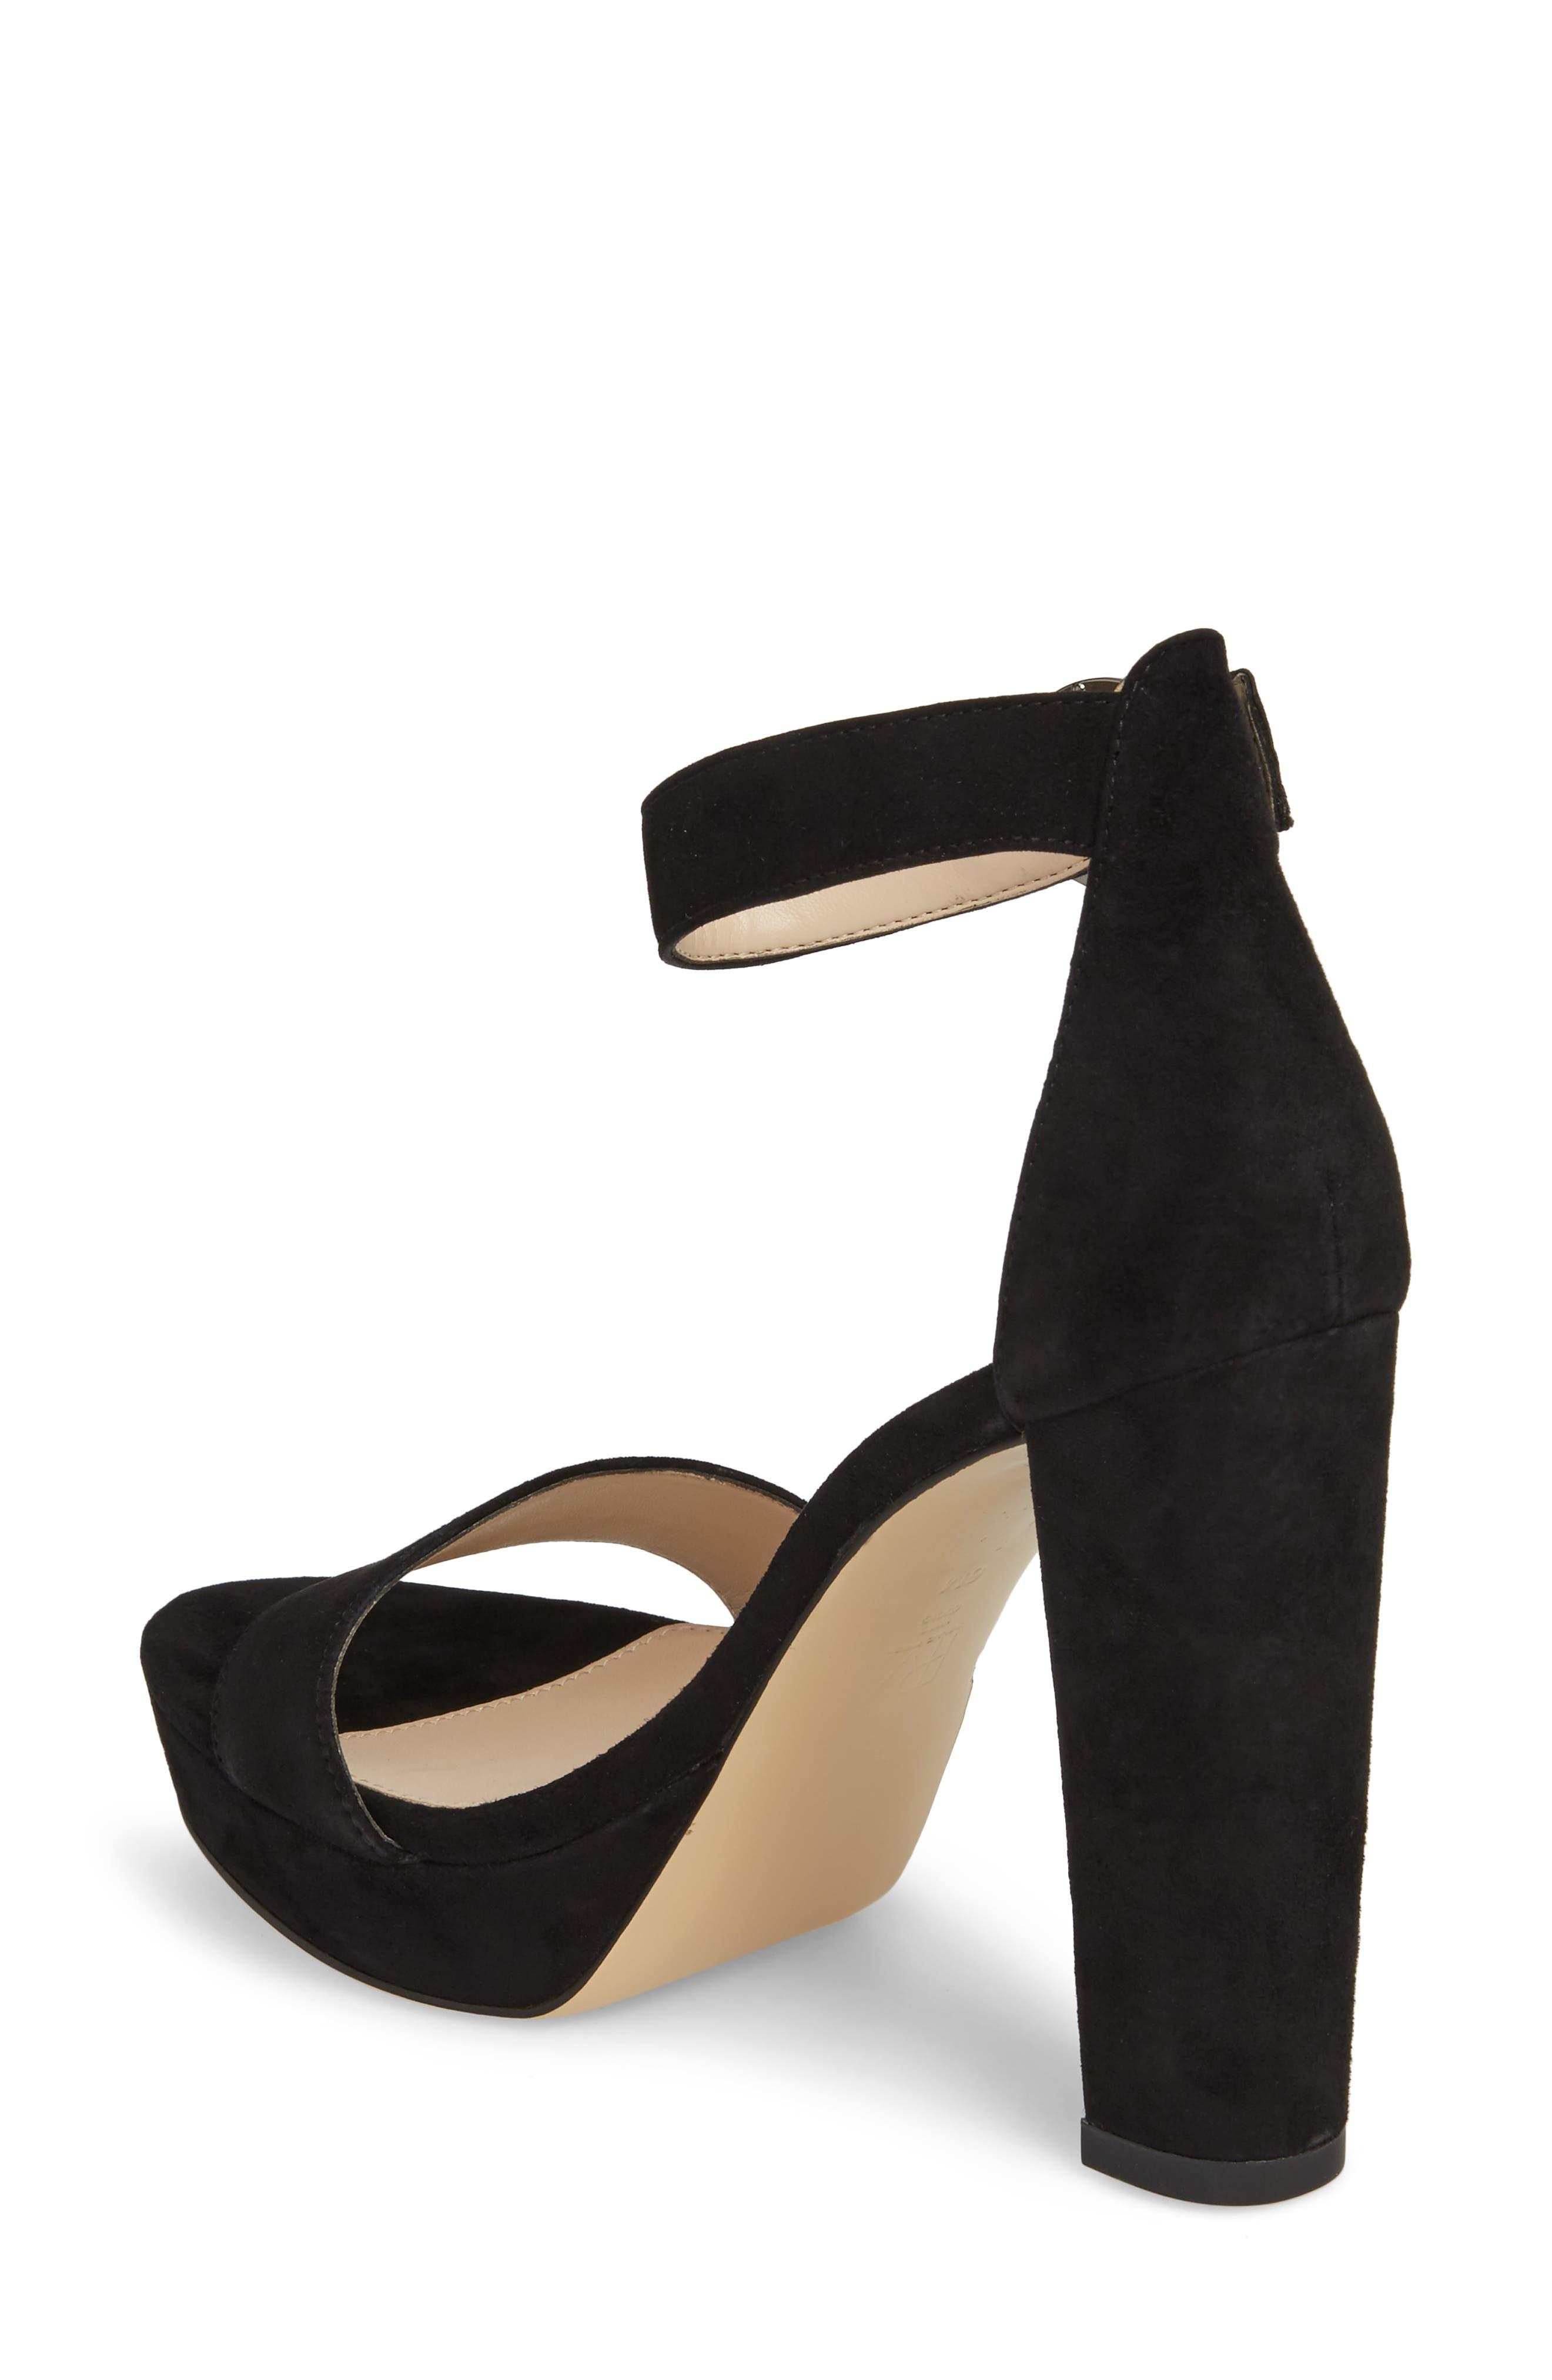 Palo 2 Platform Sandal,                             Alternate thumbnail 2, color,                             Black Suede